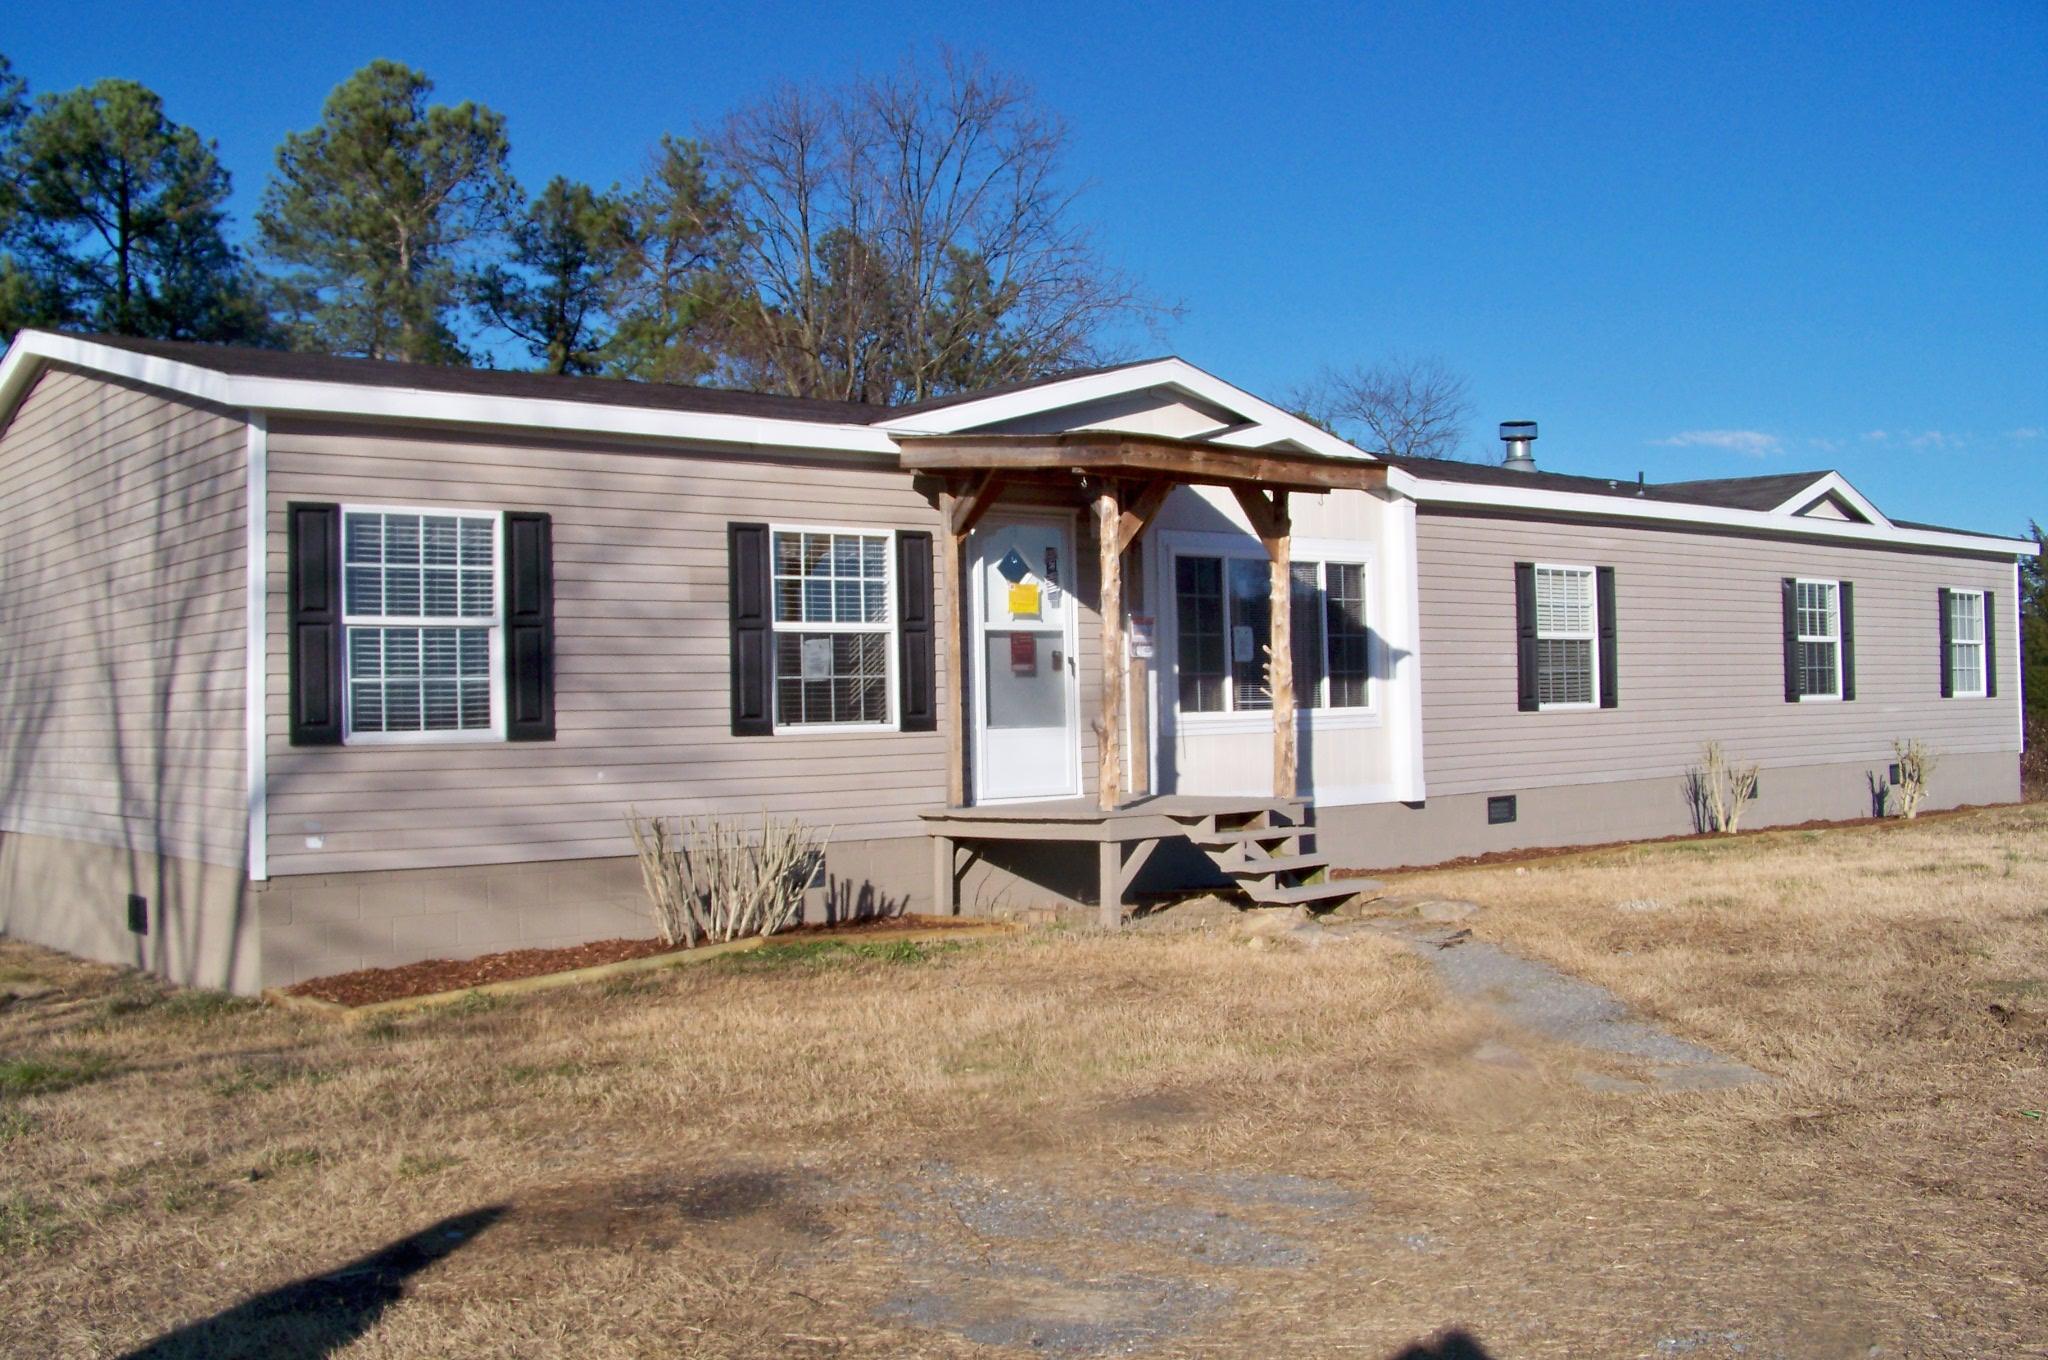 48160 HIGHWAY 75, Crossville, Alabama 35962